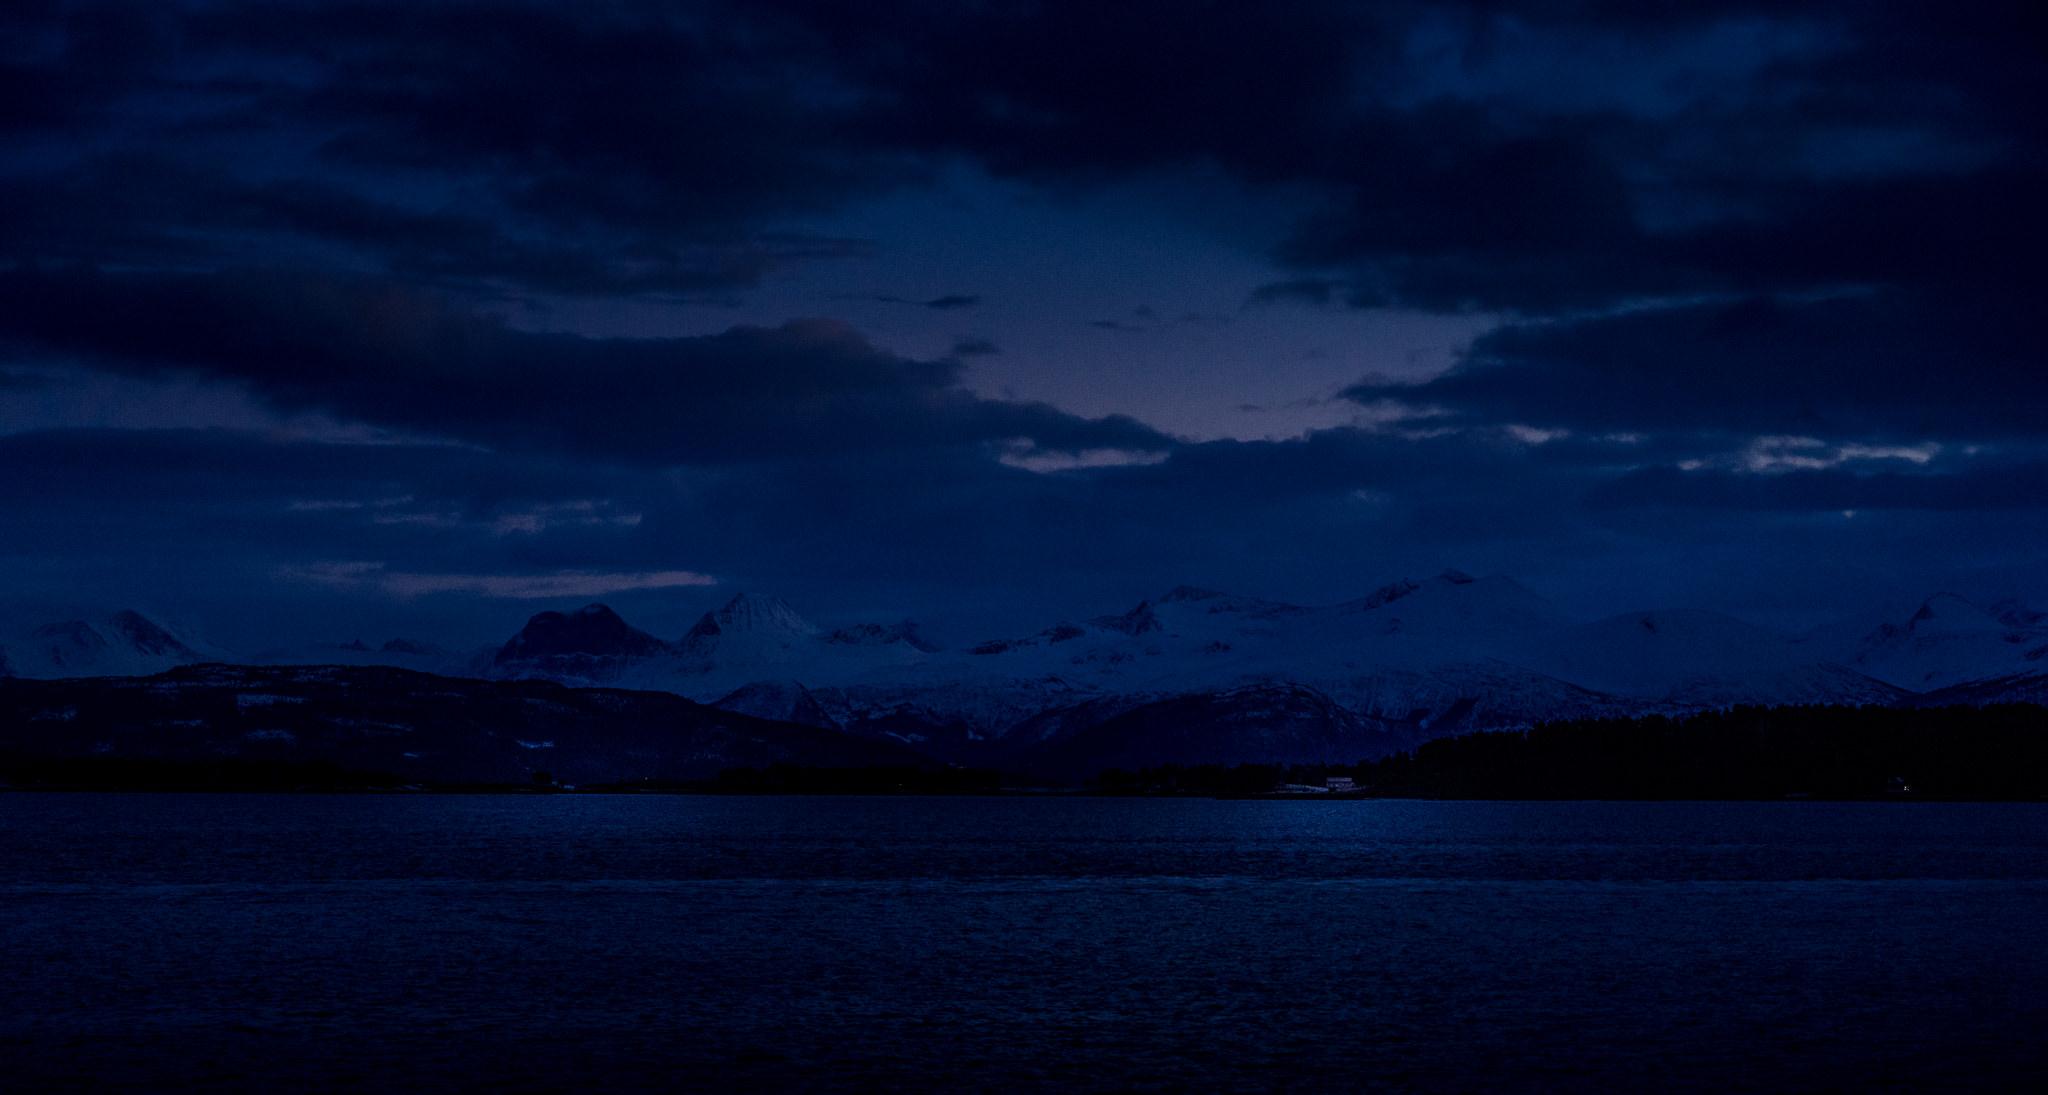 Evening in Molde